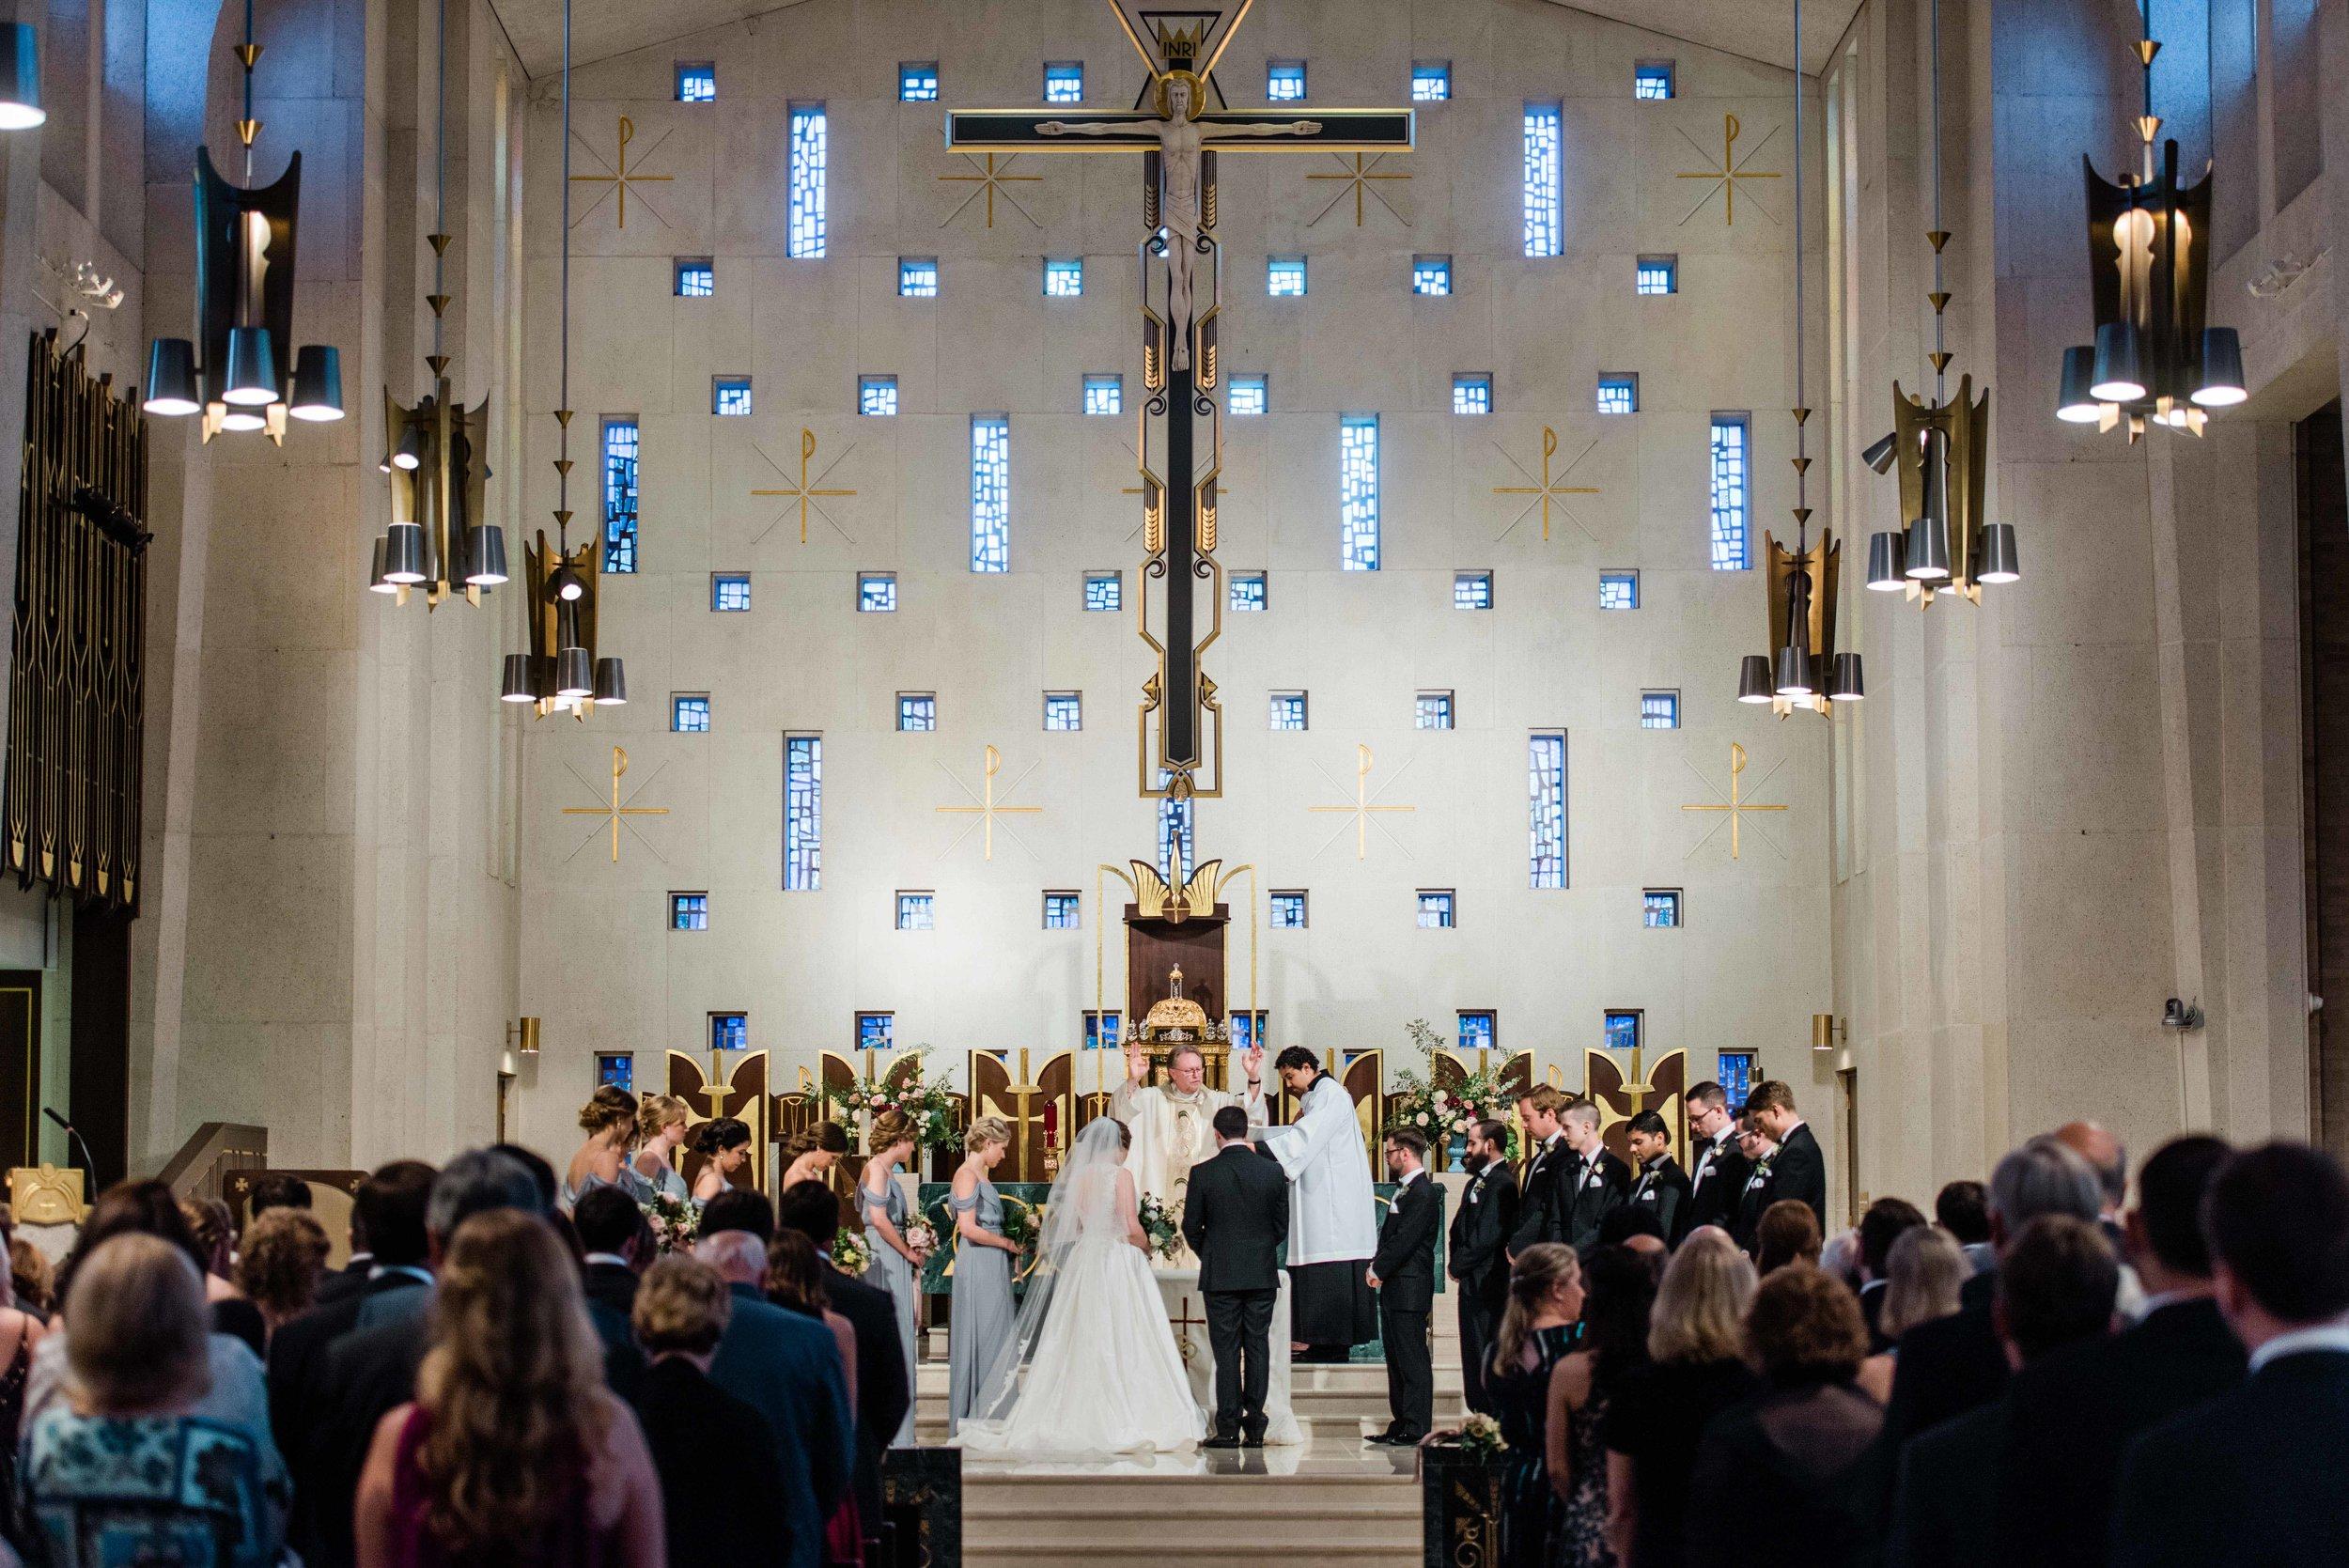 St-Michaels-Catholic-Church-Houston-Wedding-Ceremony-Josh-Dana-Fernandez-Photographer-Destination-Austin-Dallas-Fine-Art-Film-2.jpg